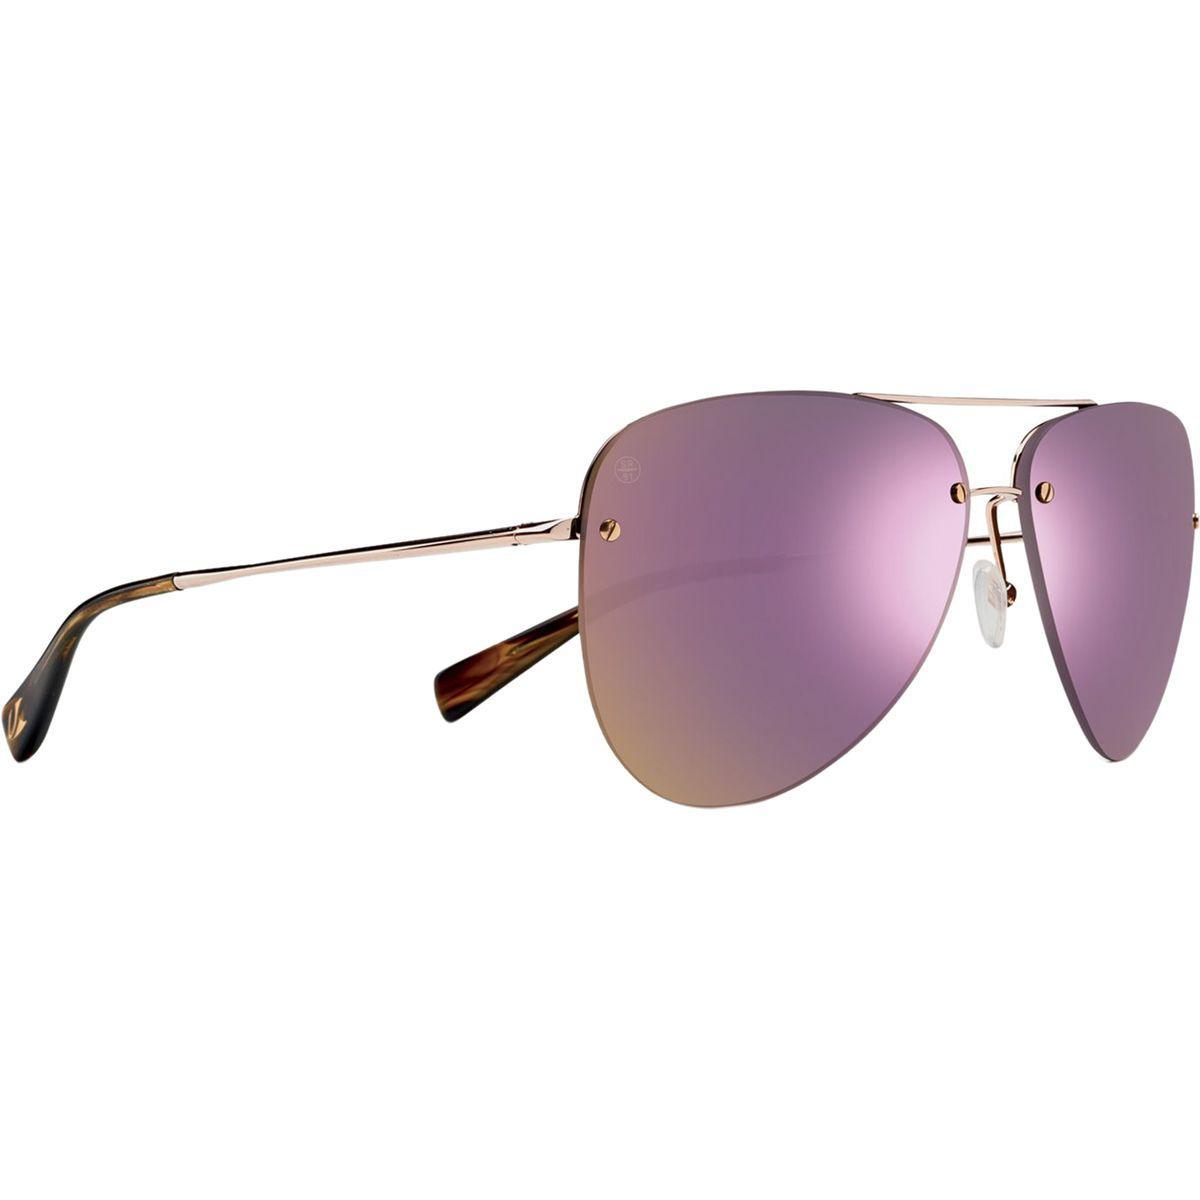 d96c72e58b2 Lyst - Kaenon Mather Sunglasses - Polarized in Purple for Men